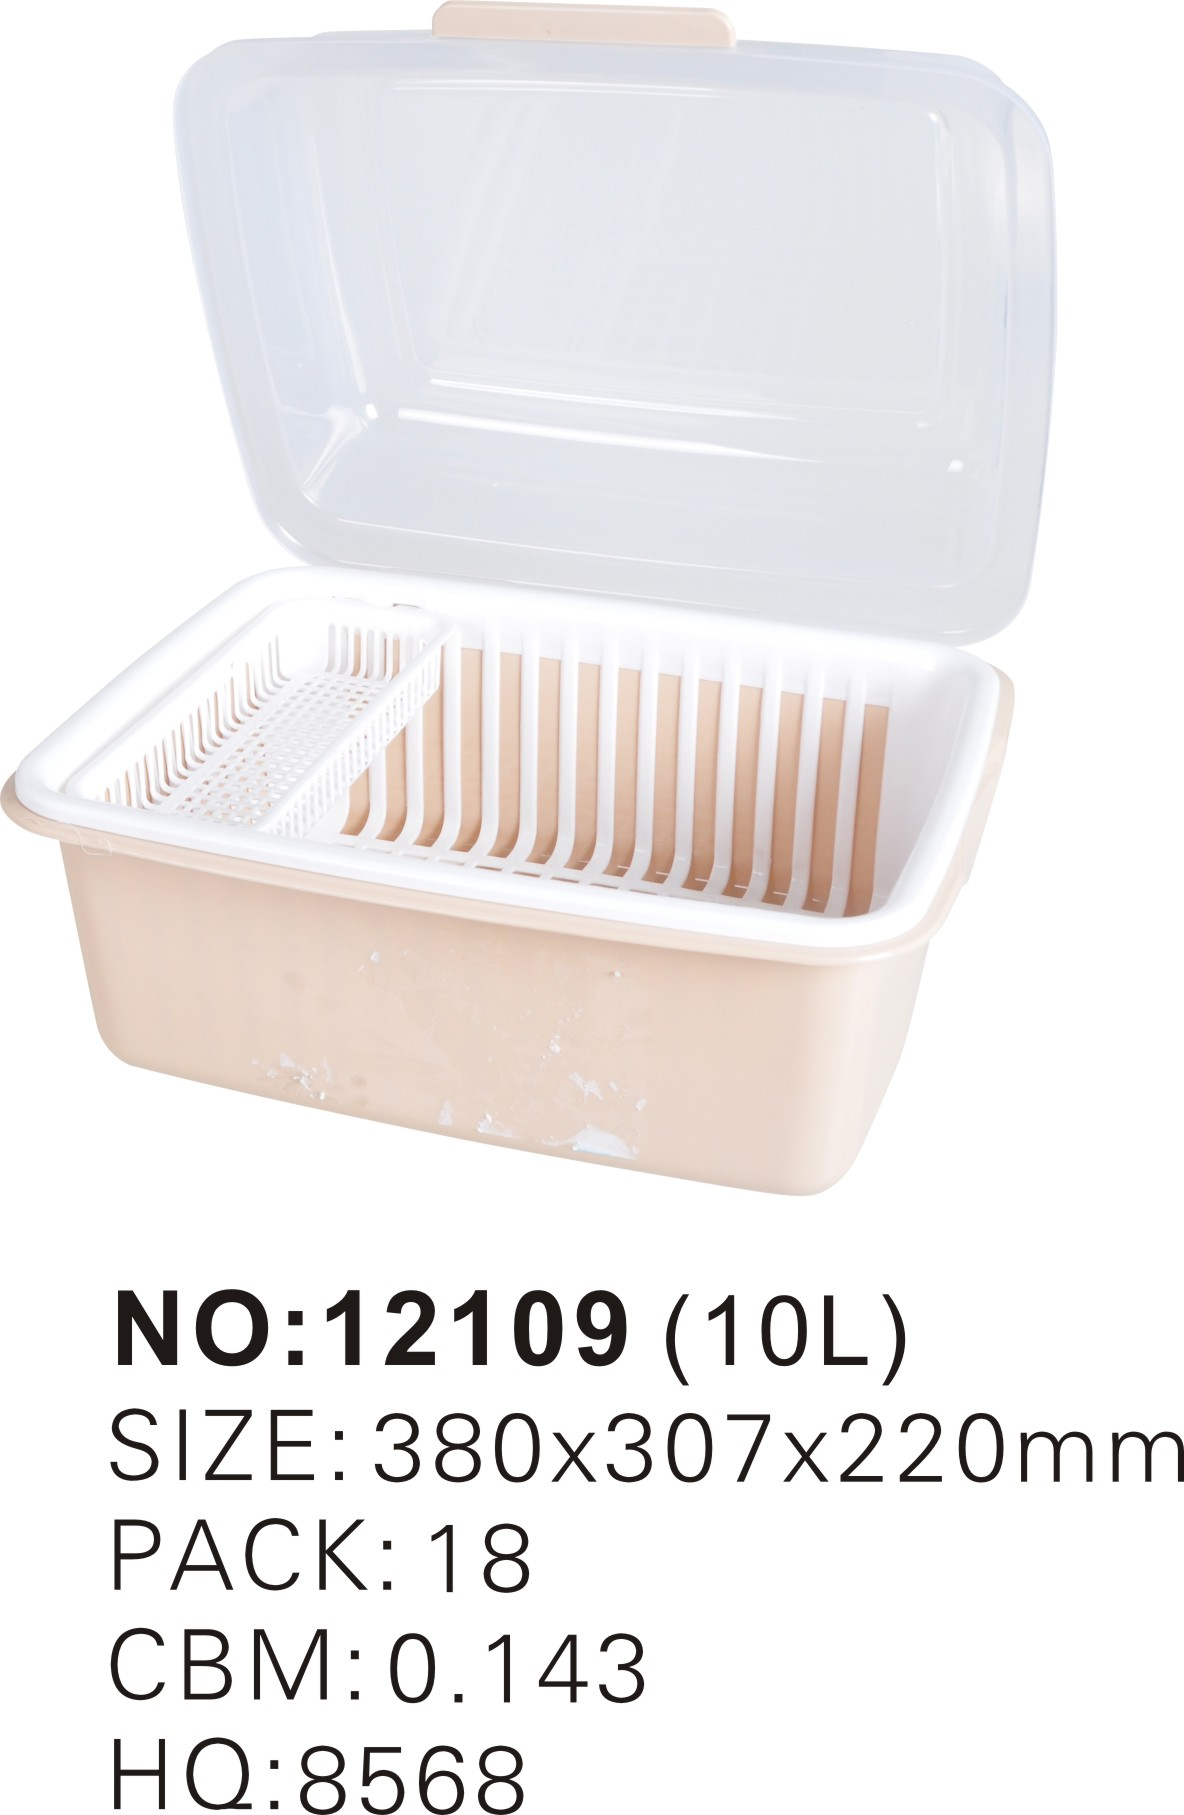 Plastic cheap dishwasher kitchen dinner plate dish drying rack View